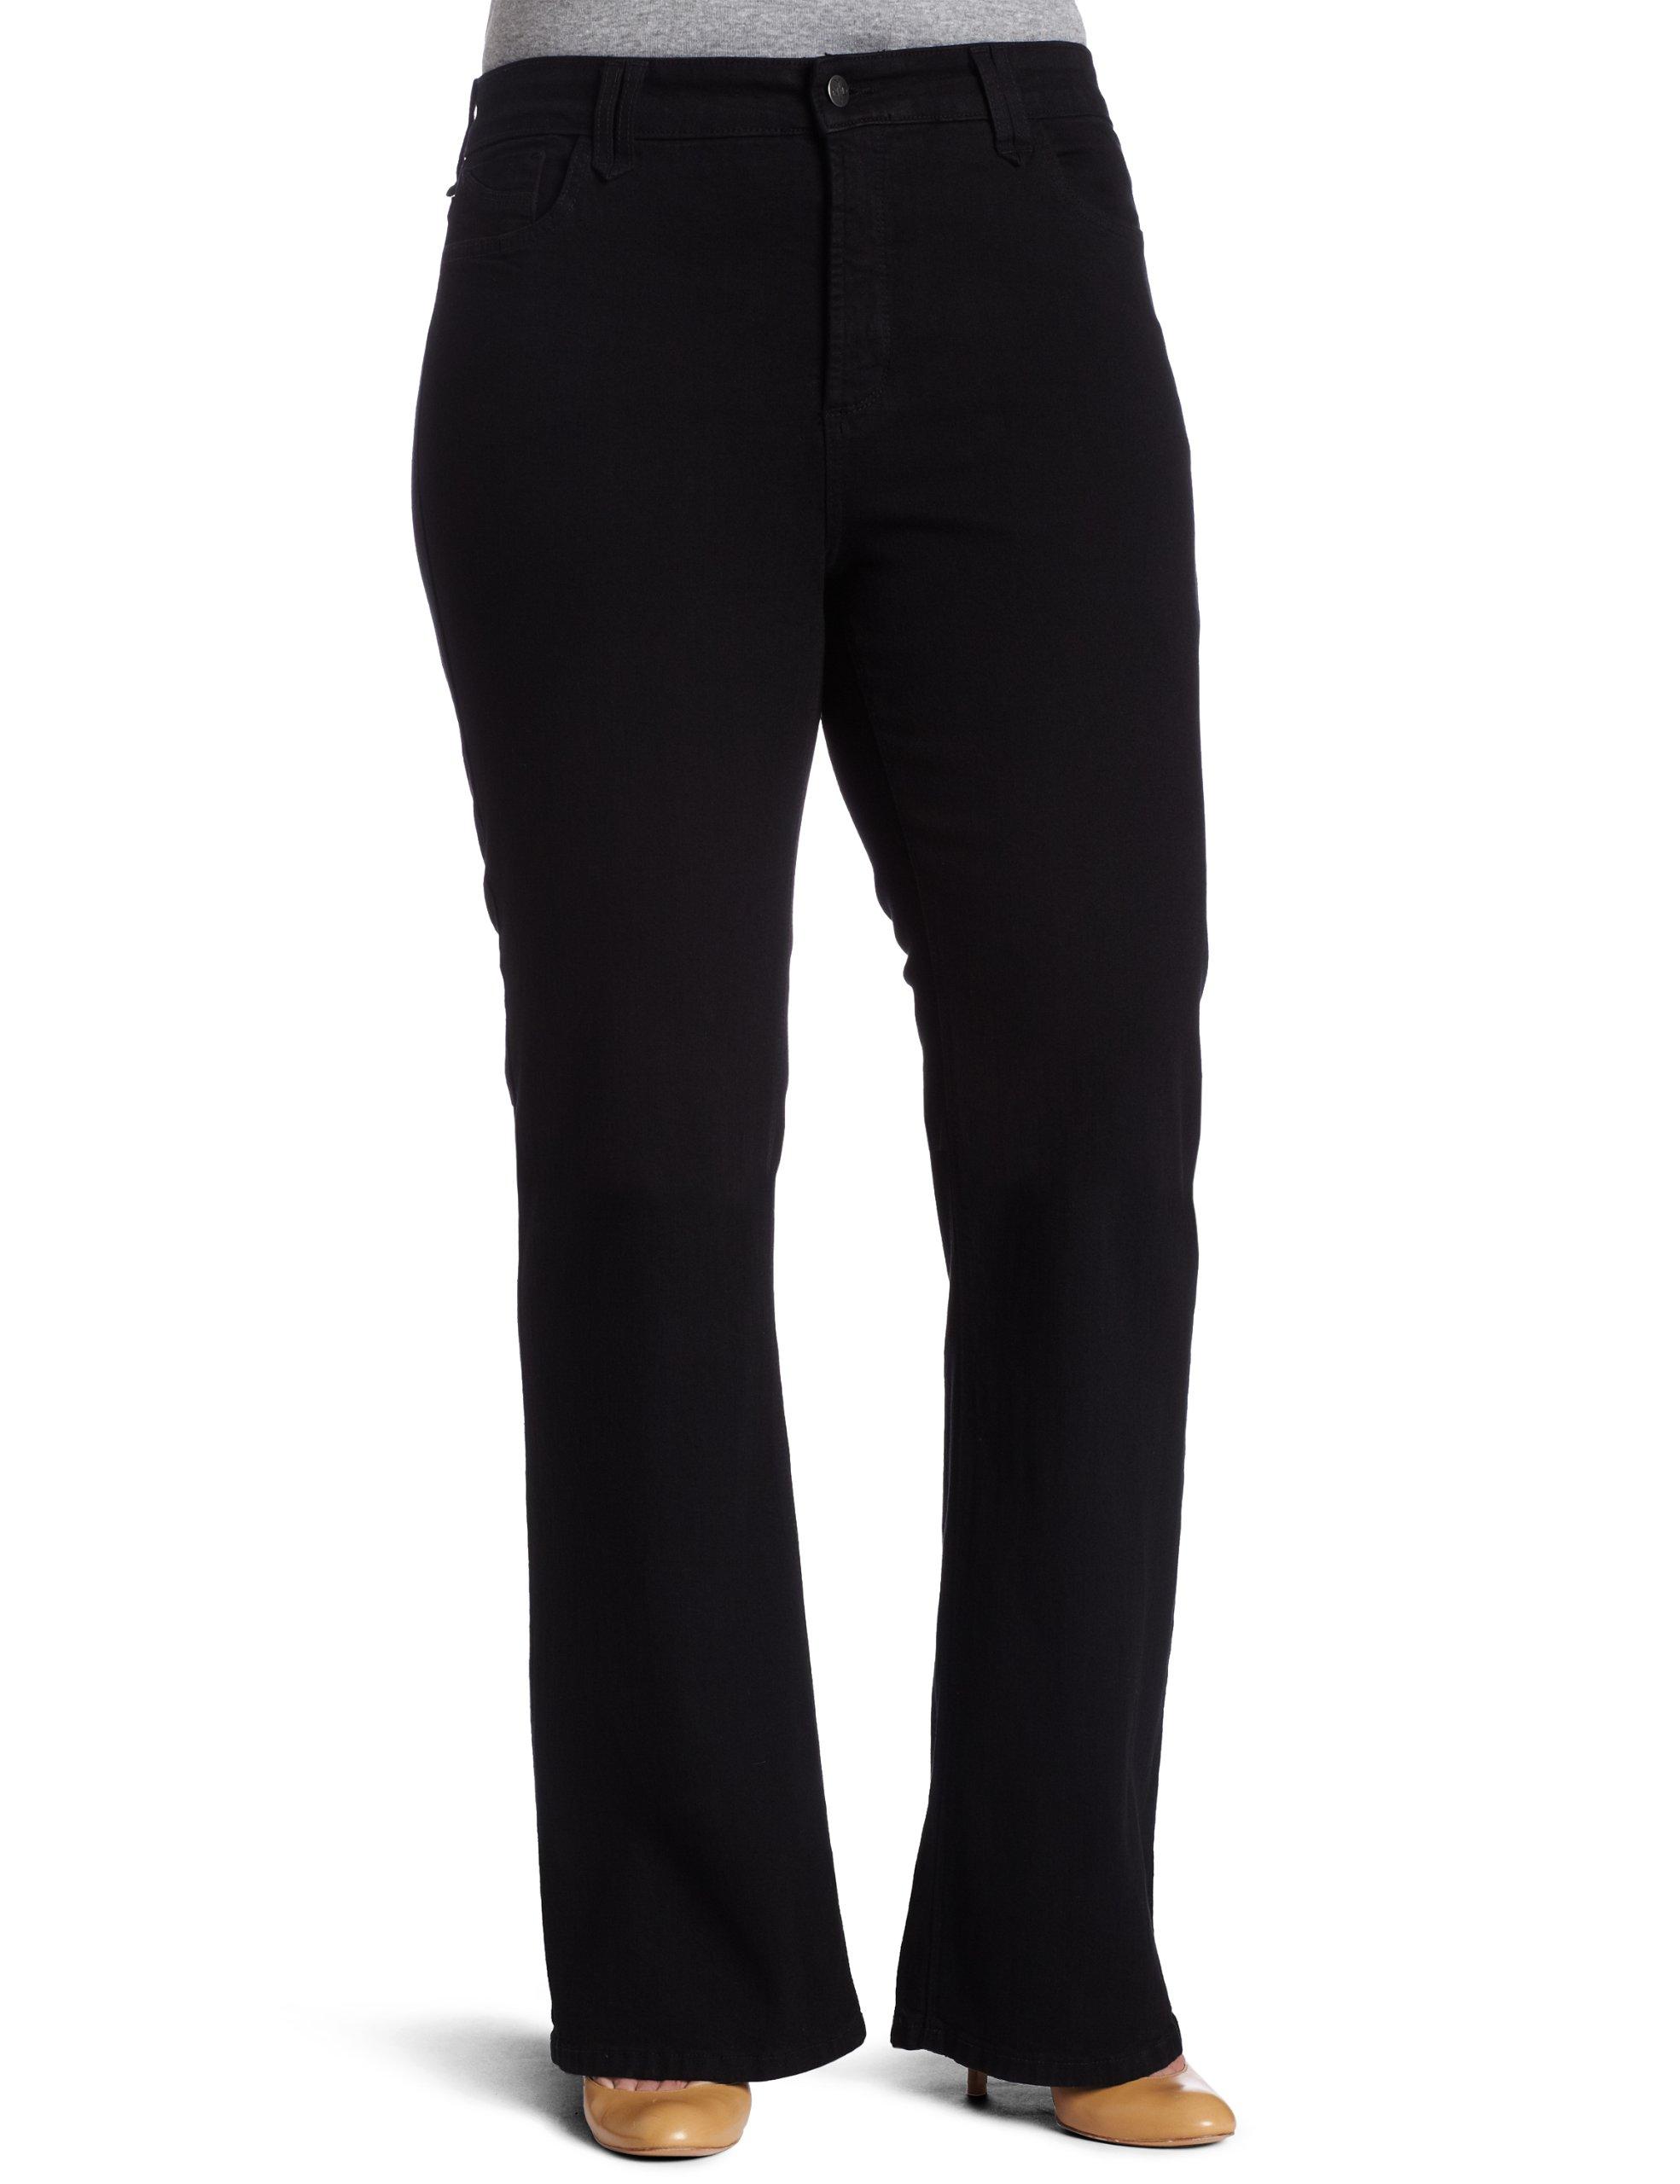 NYDJ Petite Plus-size Hayden Bootcut Jeans, Black, 22WP